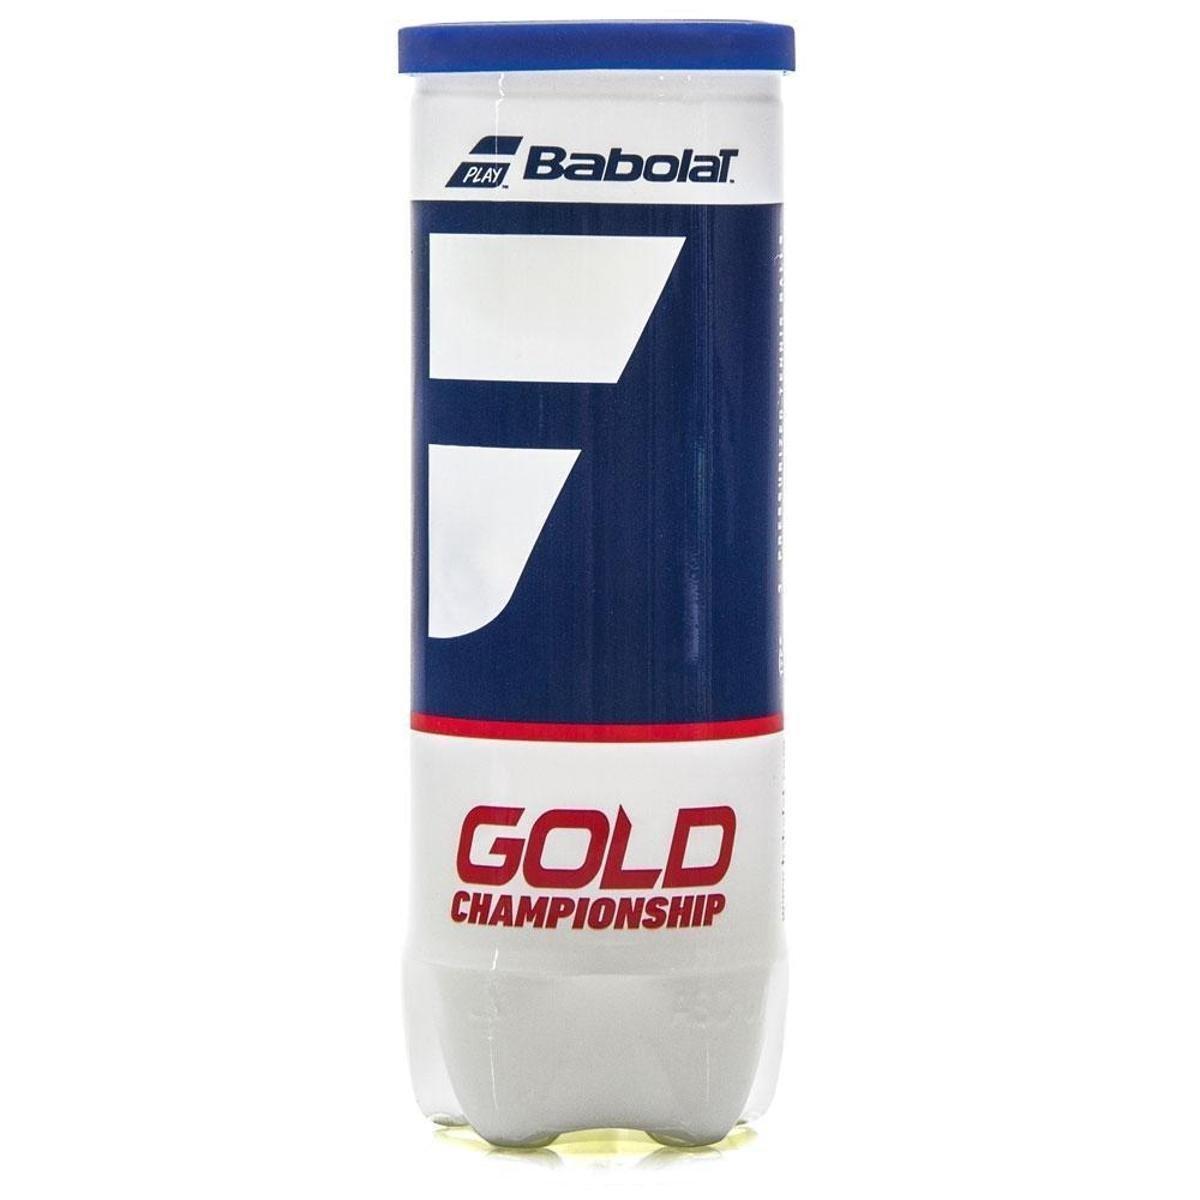 Bola de Tênis Babolat Gold Championship Tubo c/3 Unidades